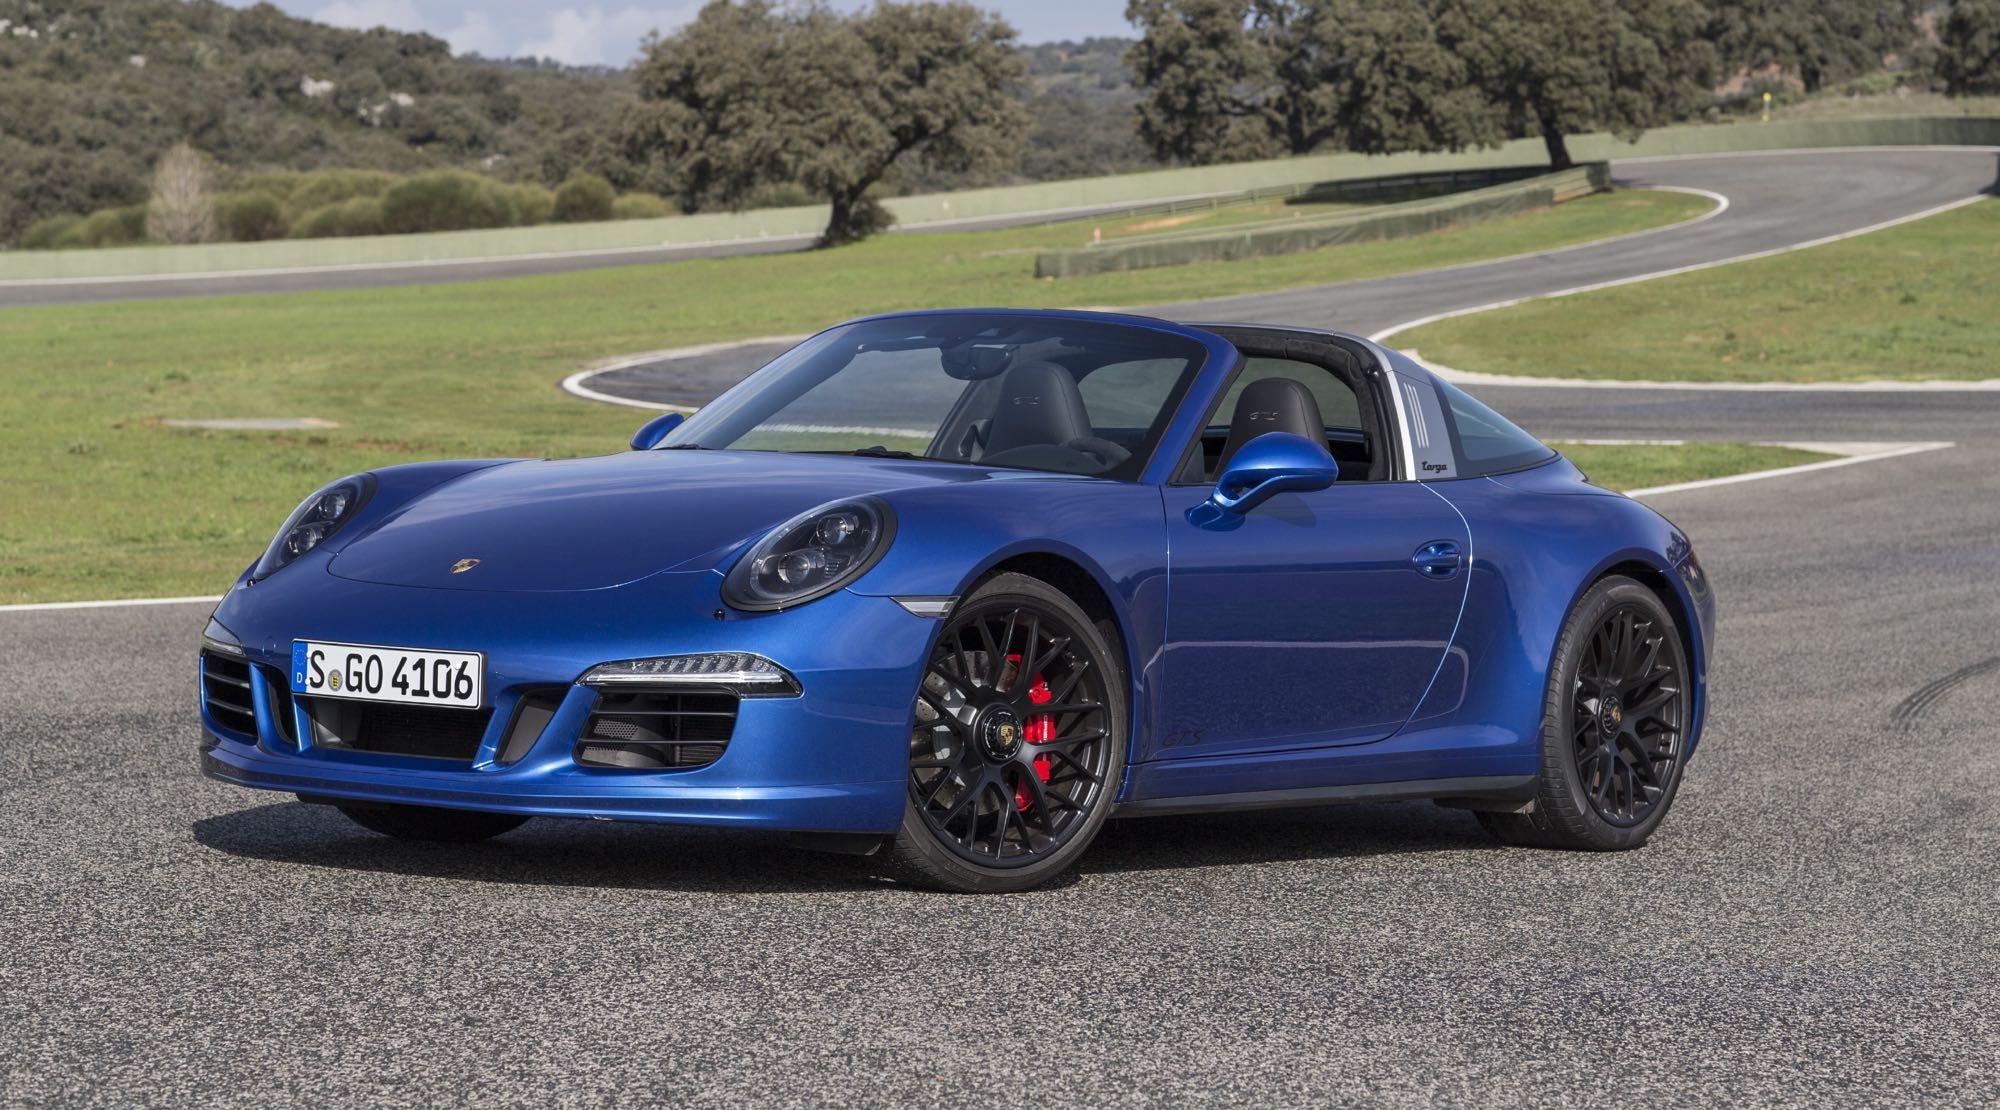 2015 Porsche 911 Targa 4 Gts Review Caradvice